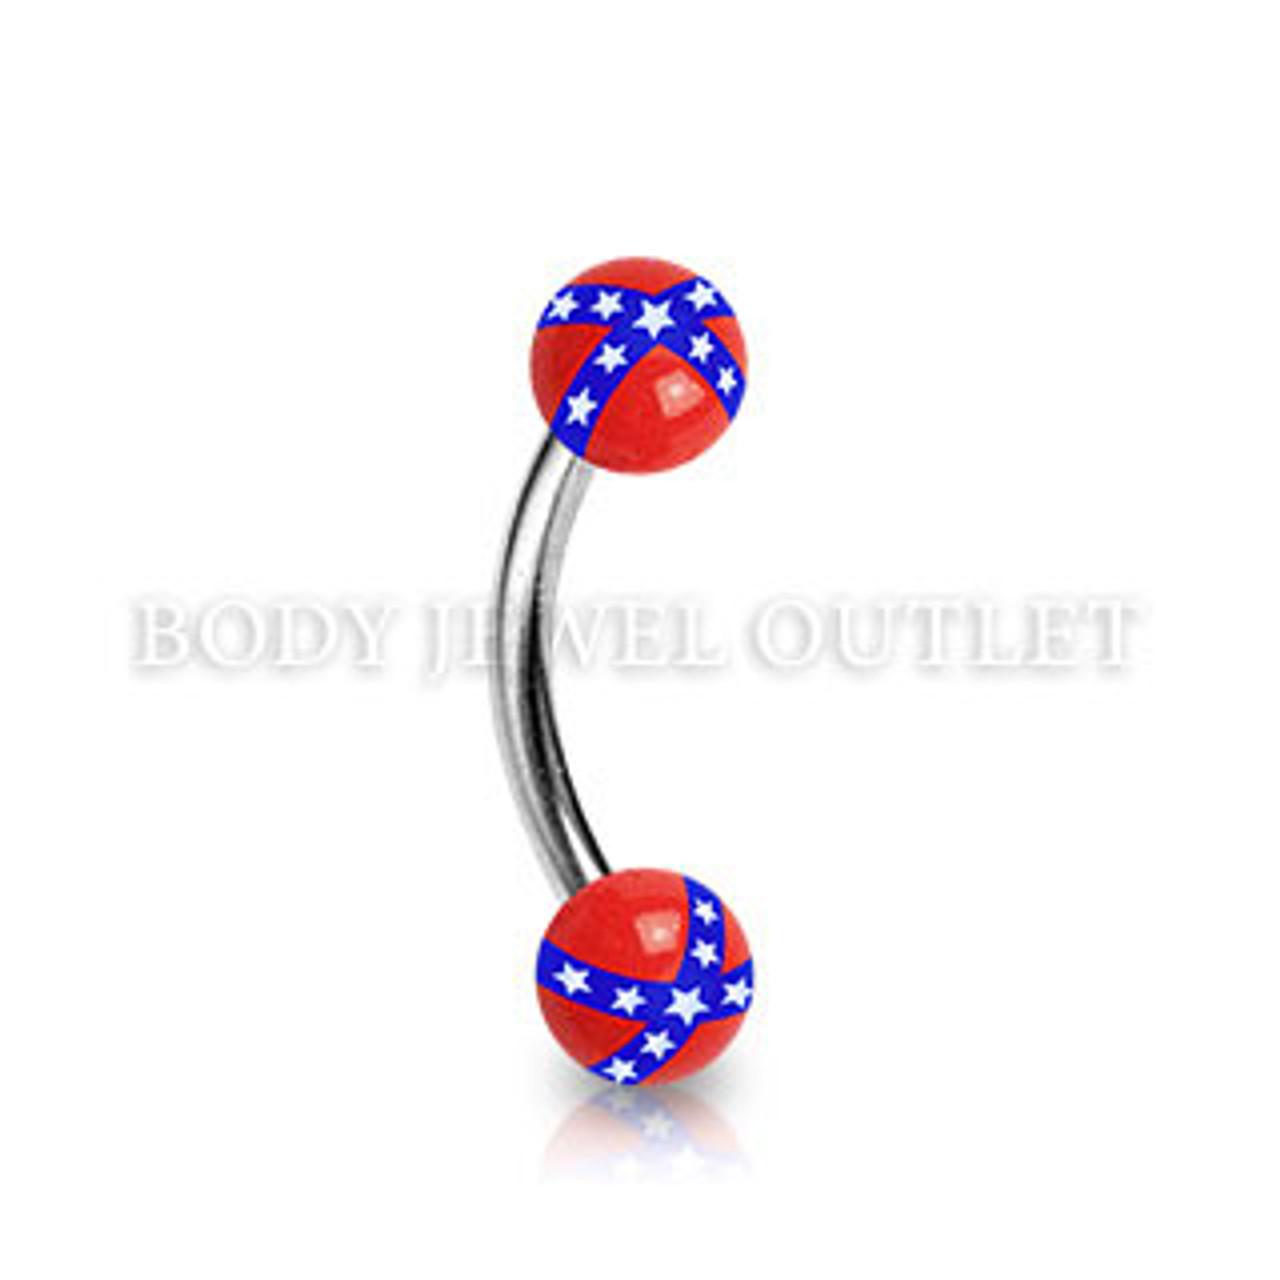 Eyebrow Piercing Steel w/ Rebel Flag on Acrylic Ball | BodyJewelOutlet confederate flag,